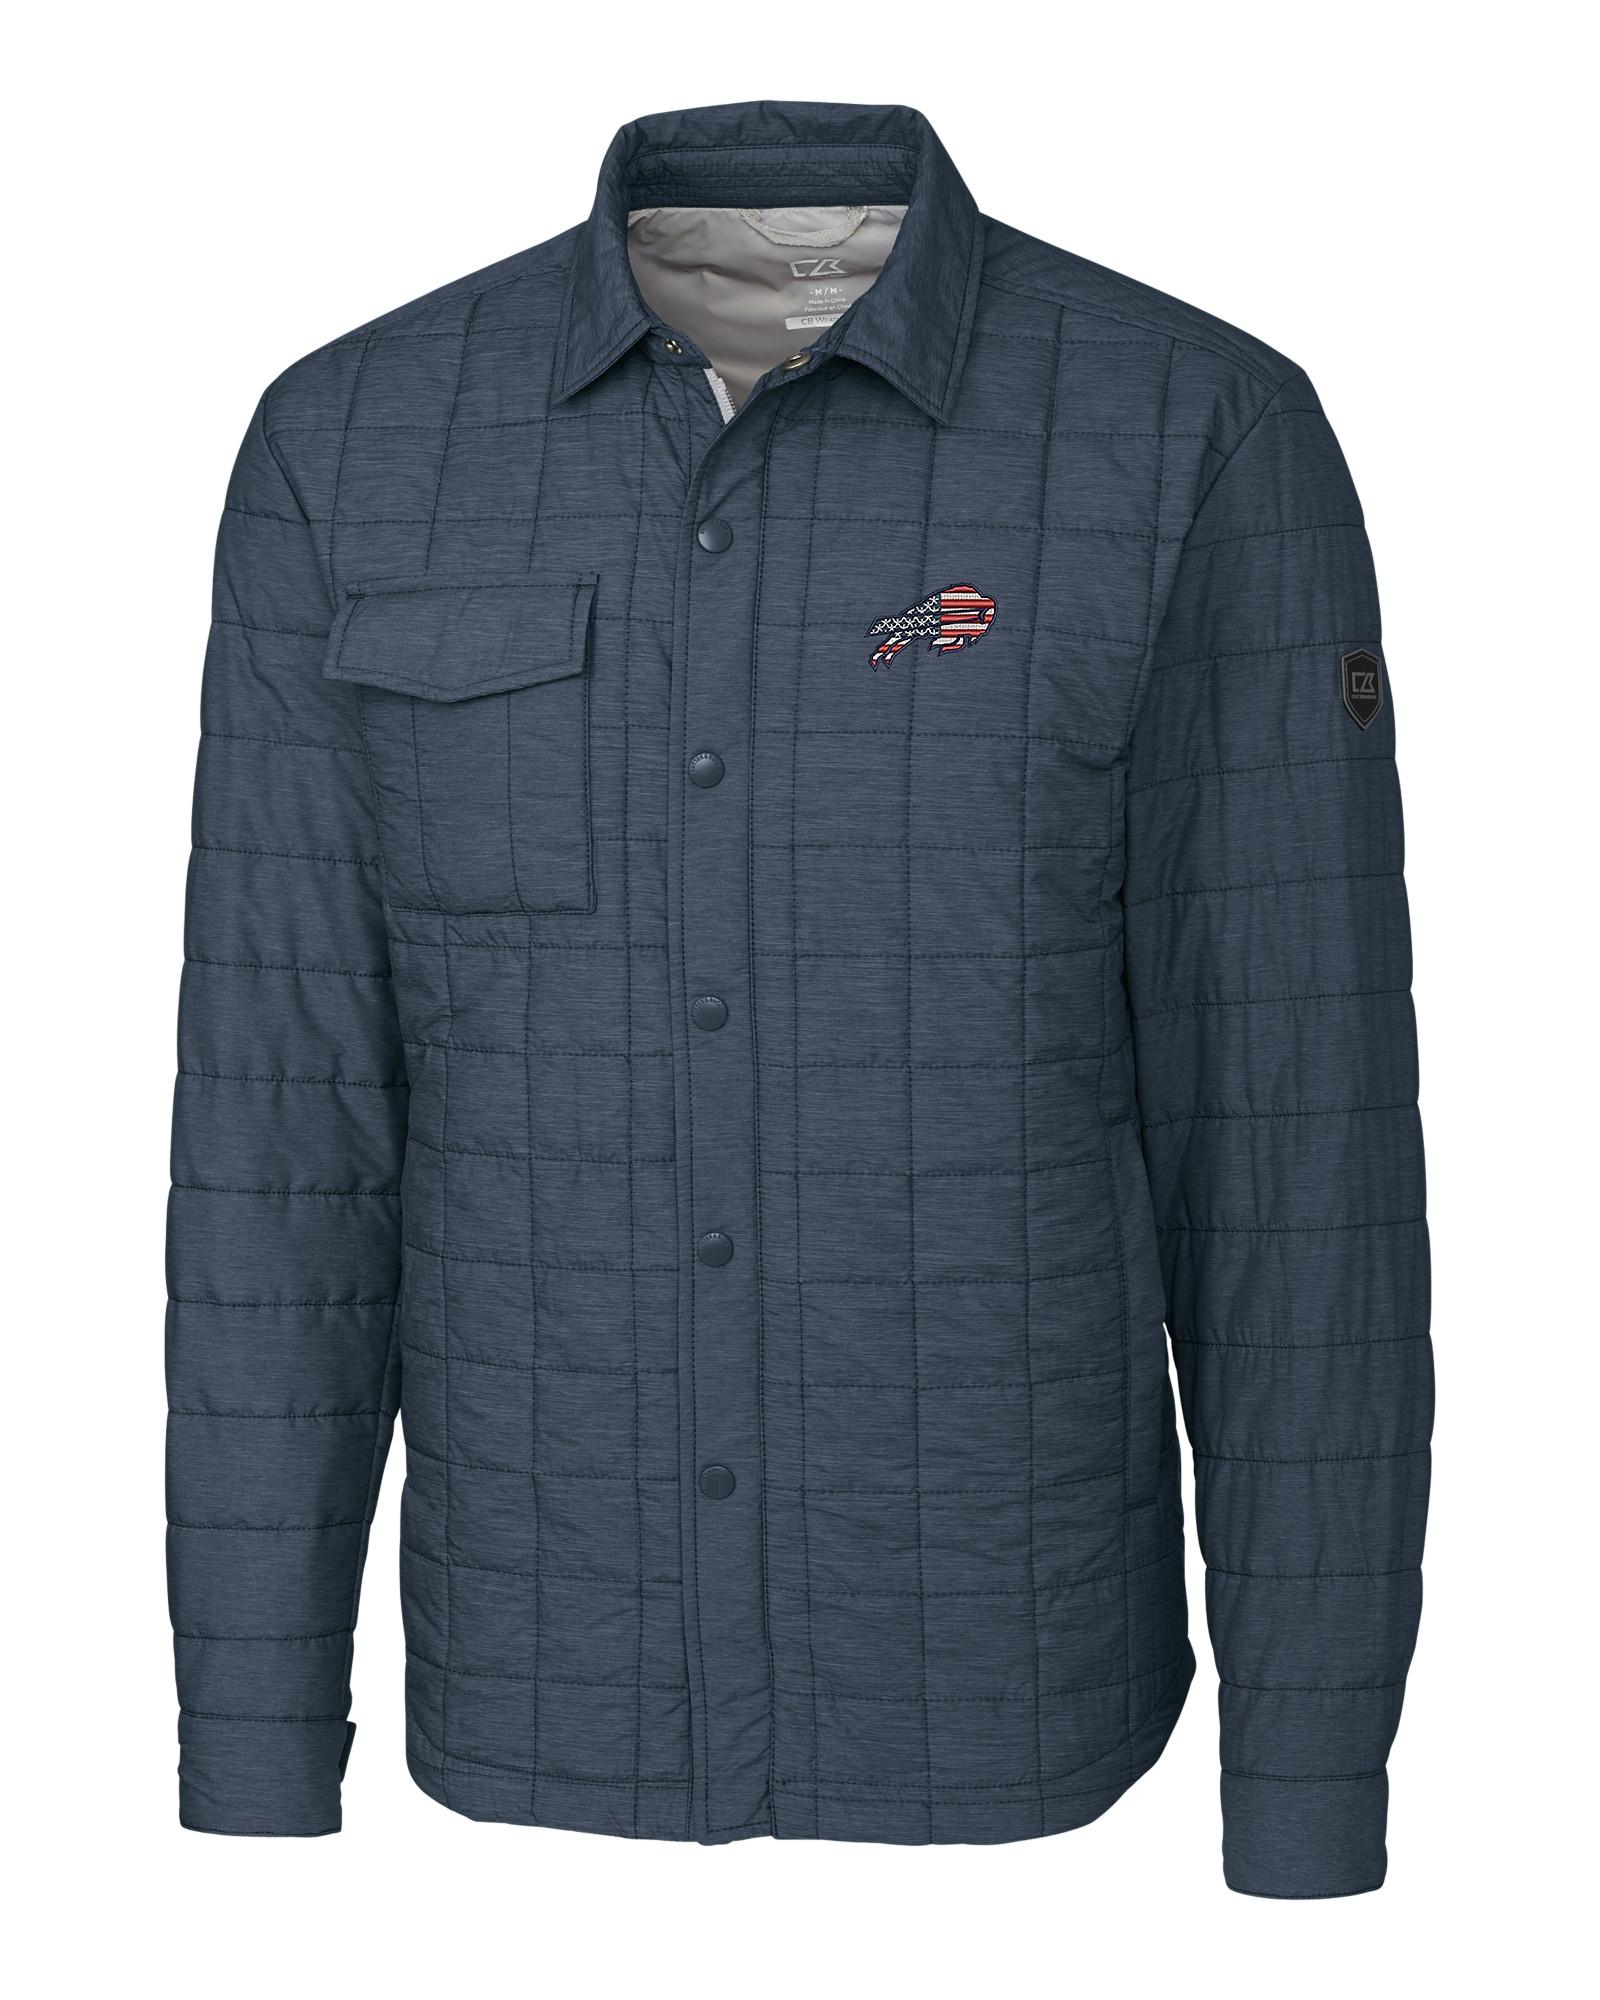 995a638c Buffalo Bills Americana Rainier Shirt Jacket